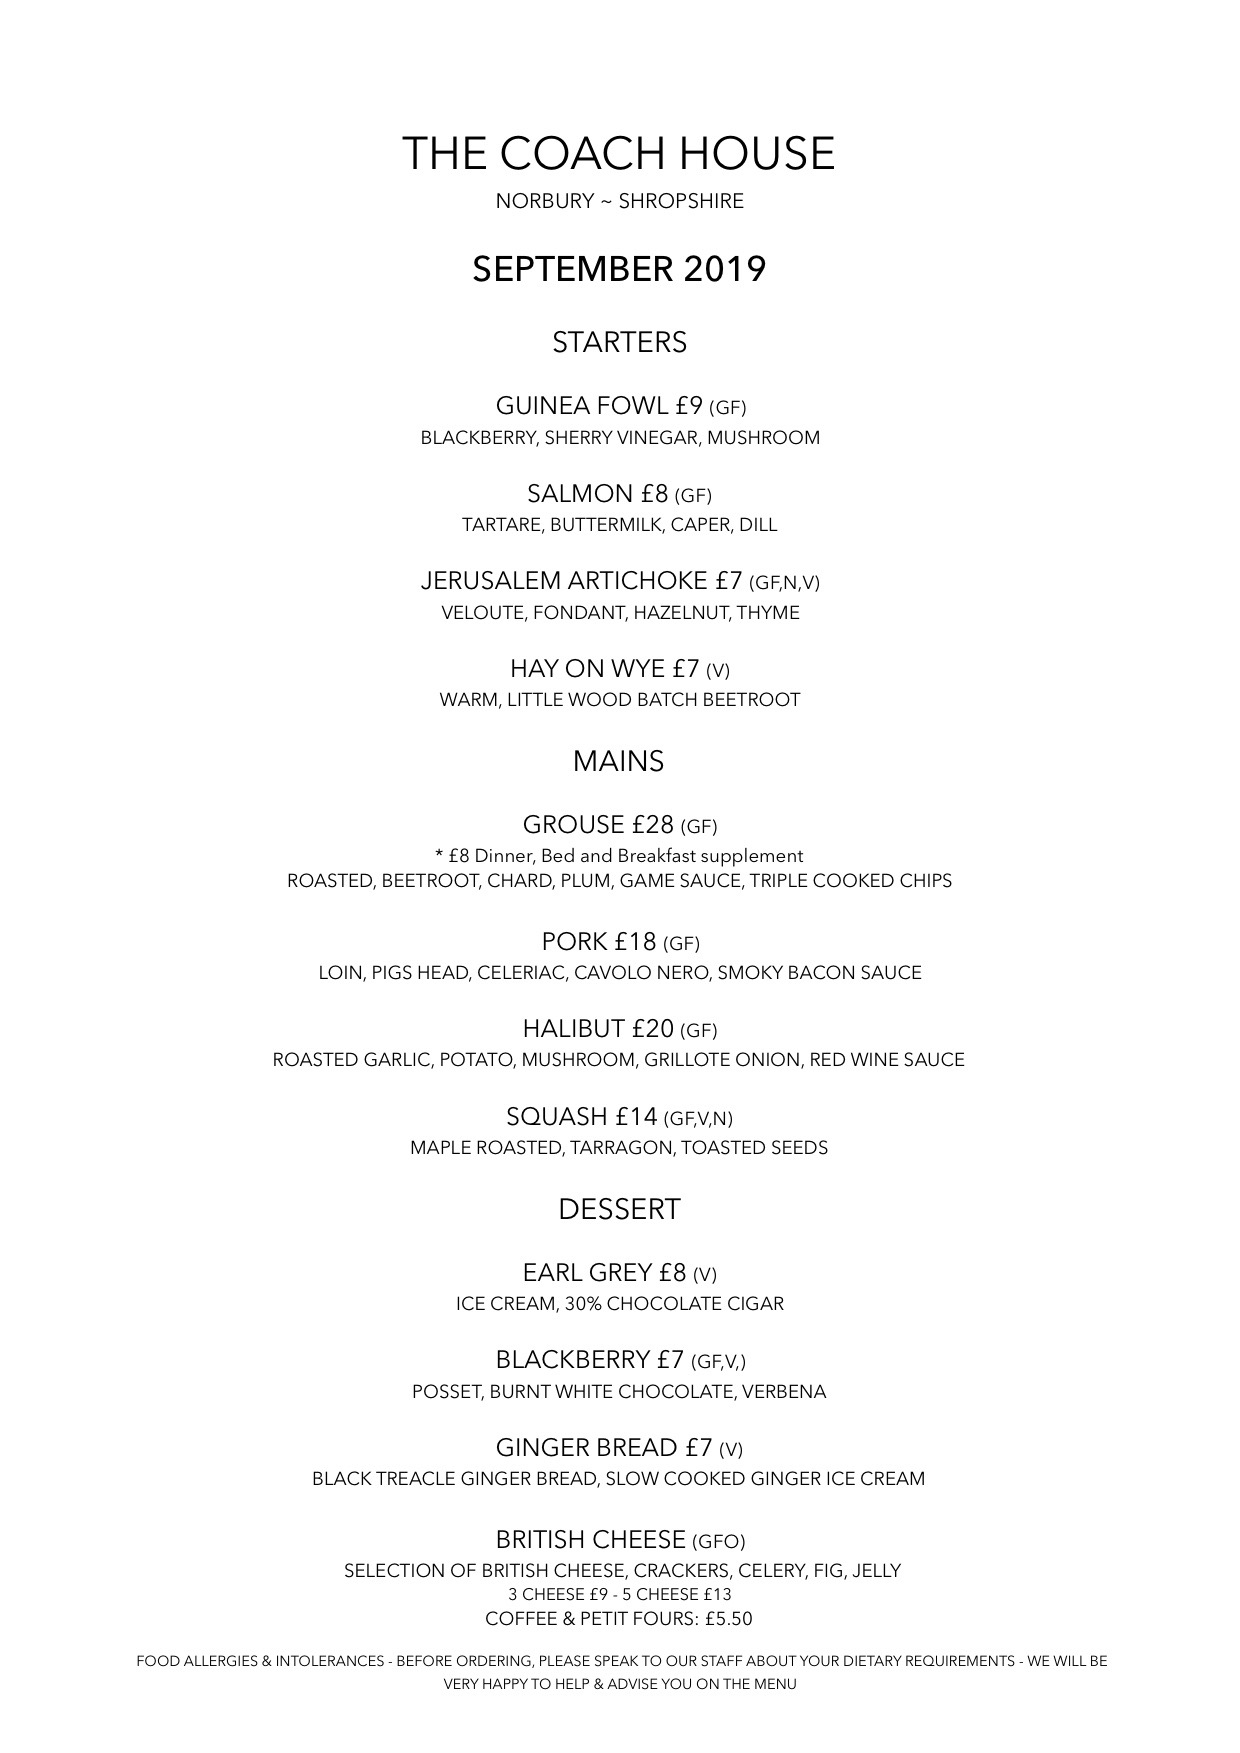 SEPTEMBER 2019 MENU PDF.jpg